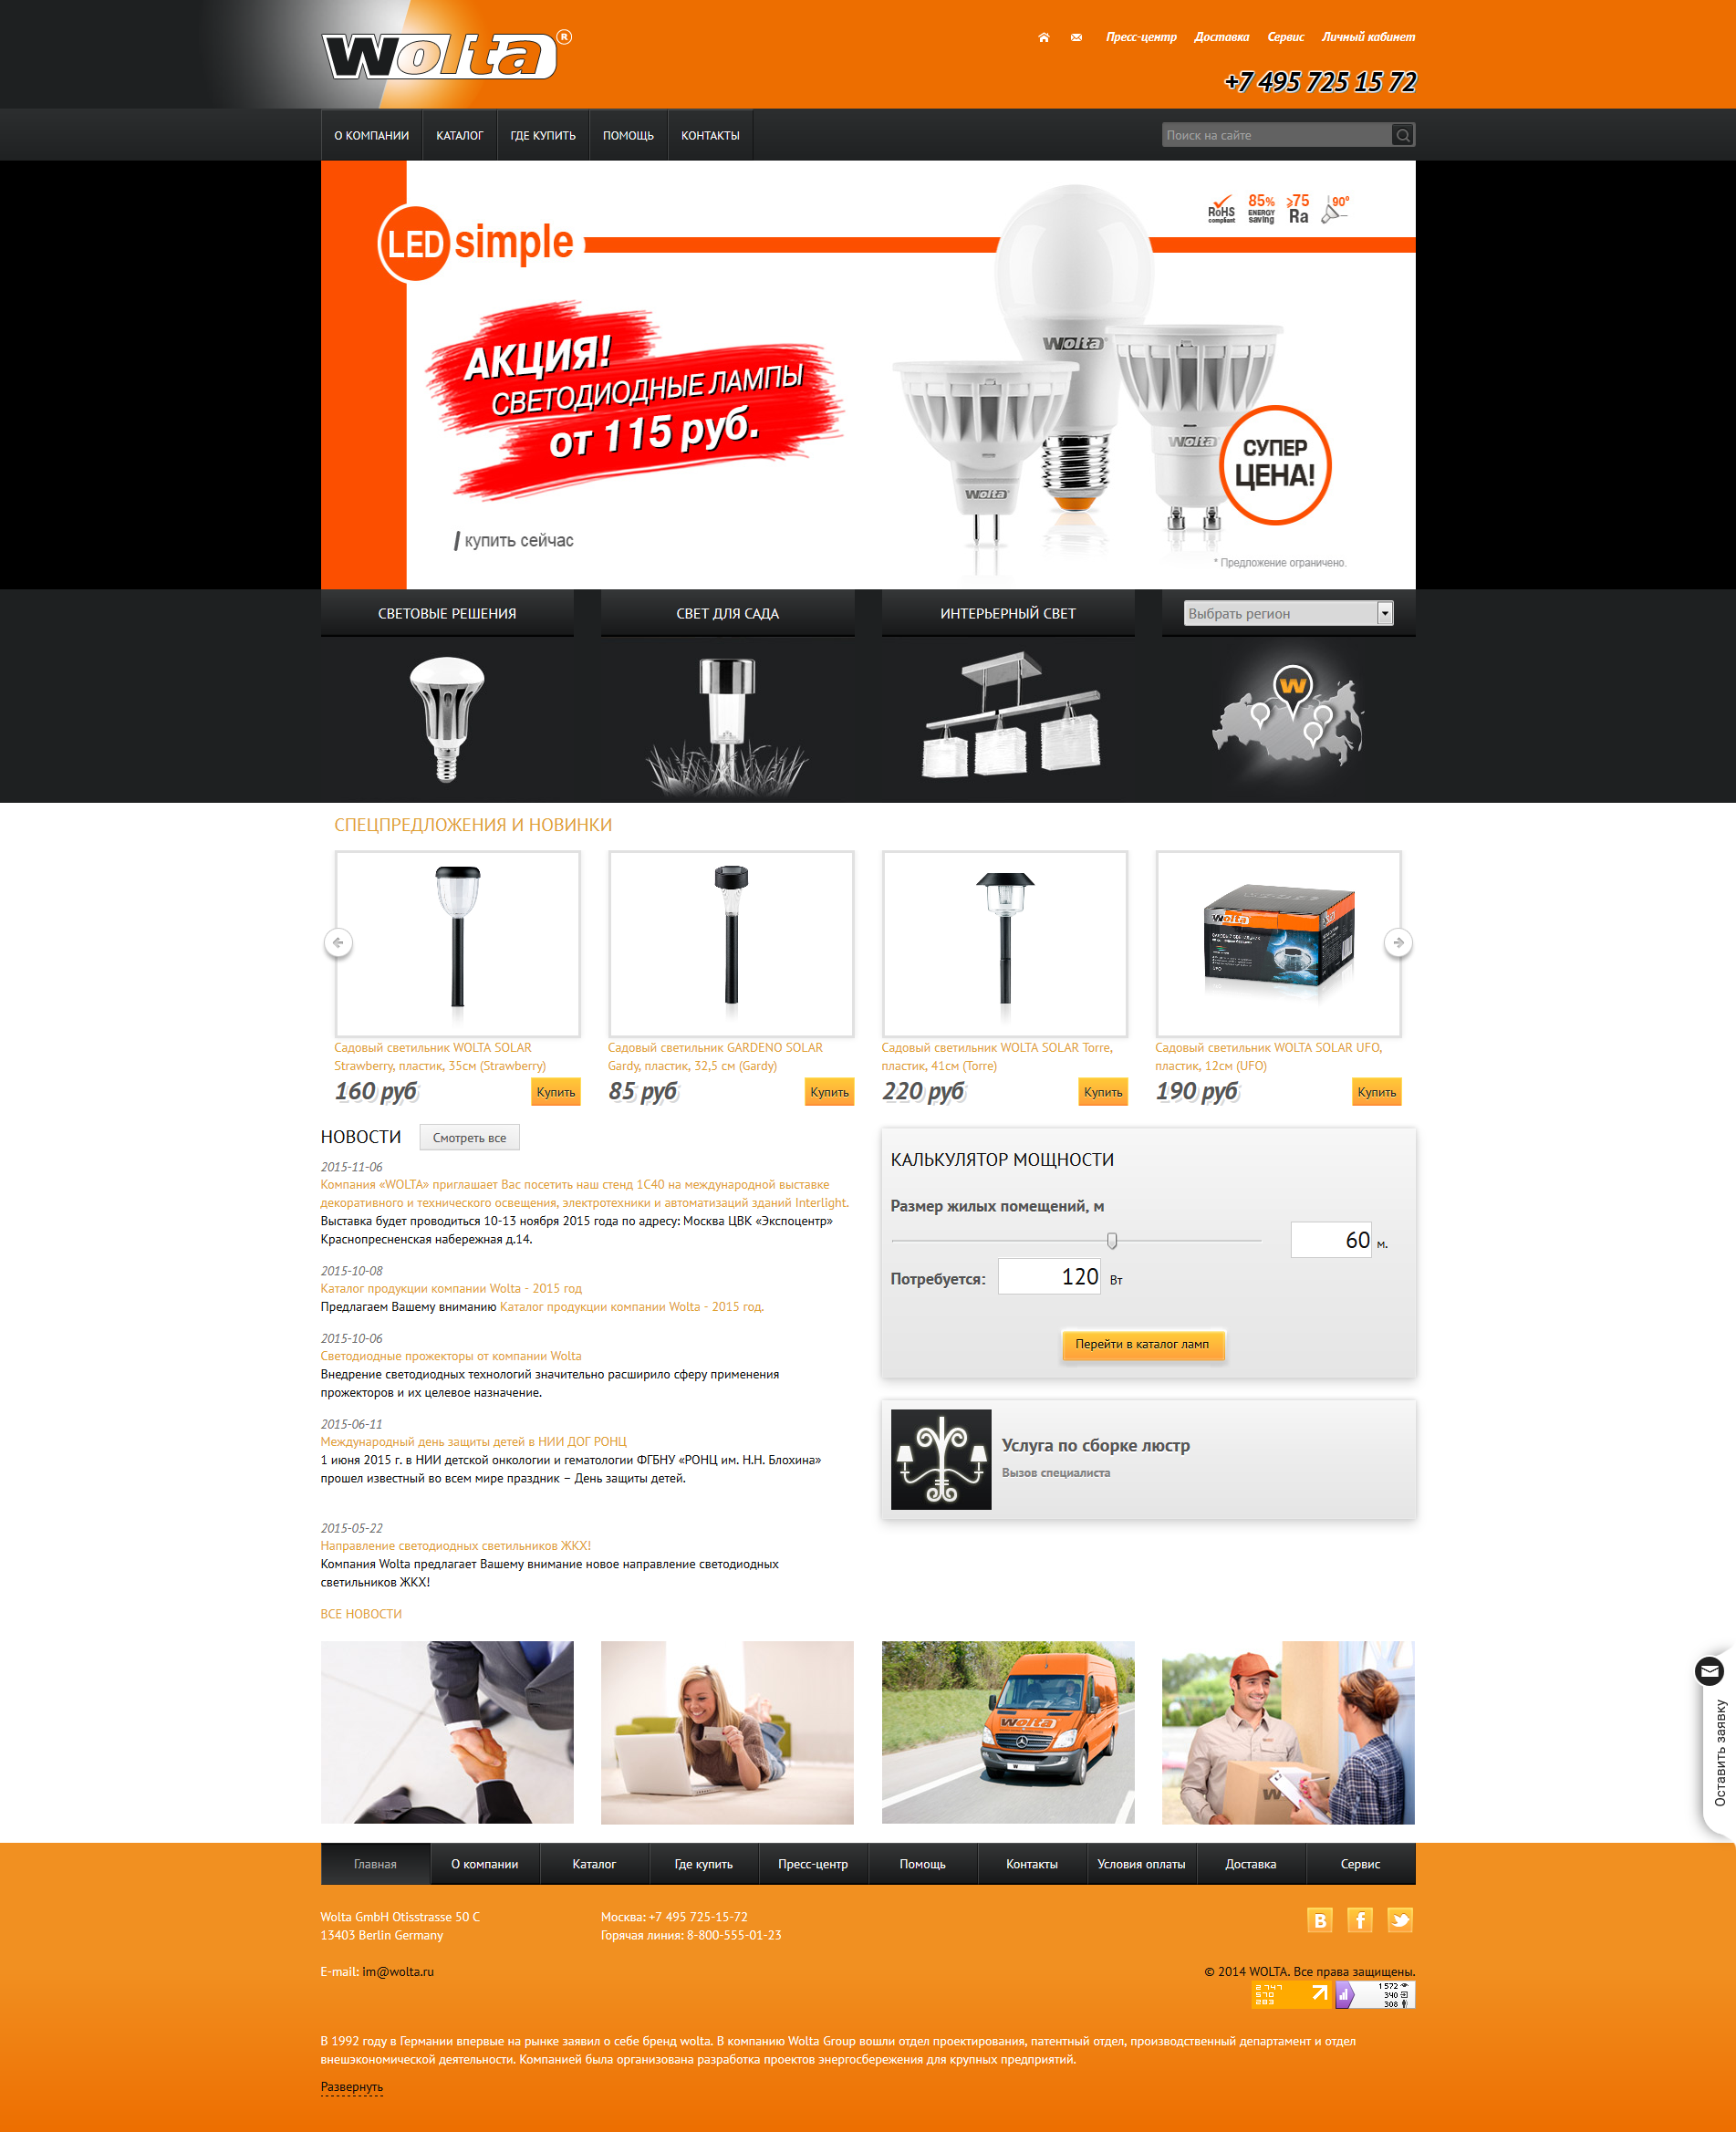 wolta.ru - сайт Российского представителя  Wolta Group